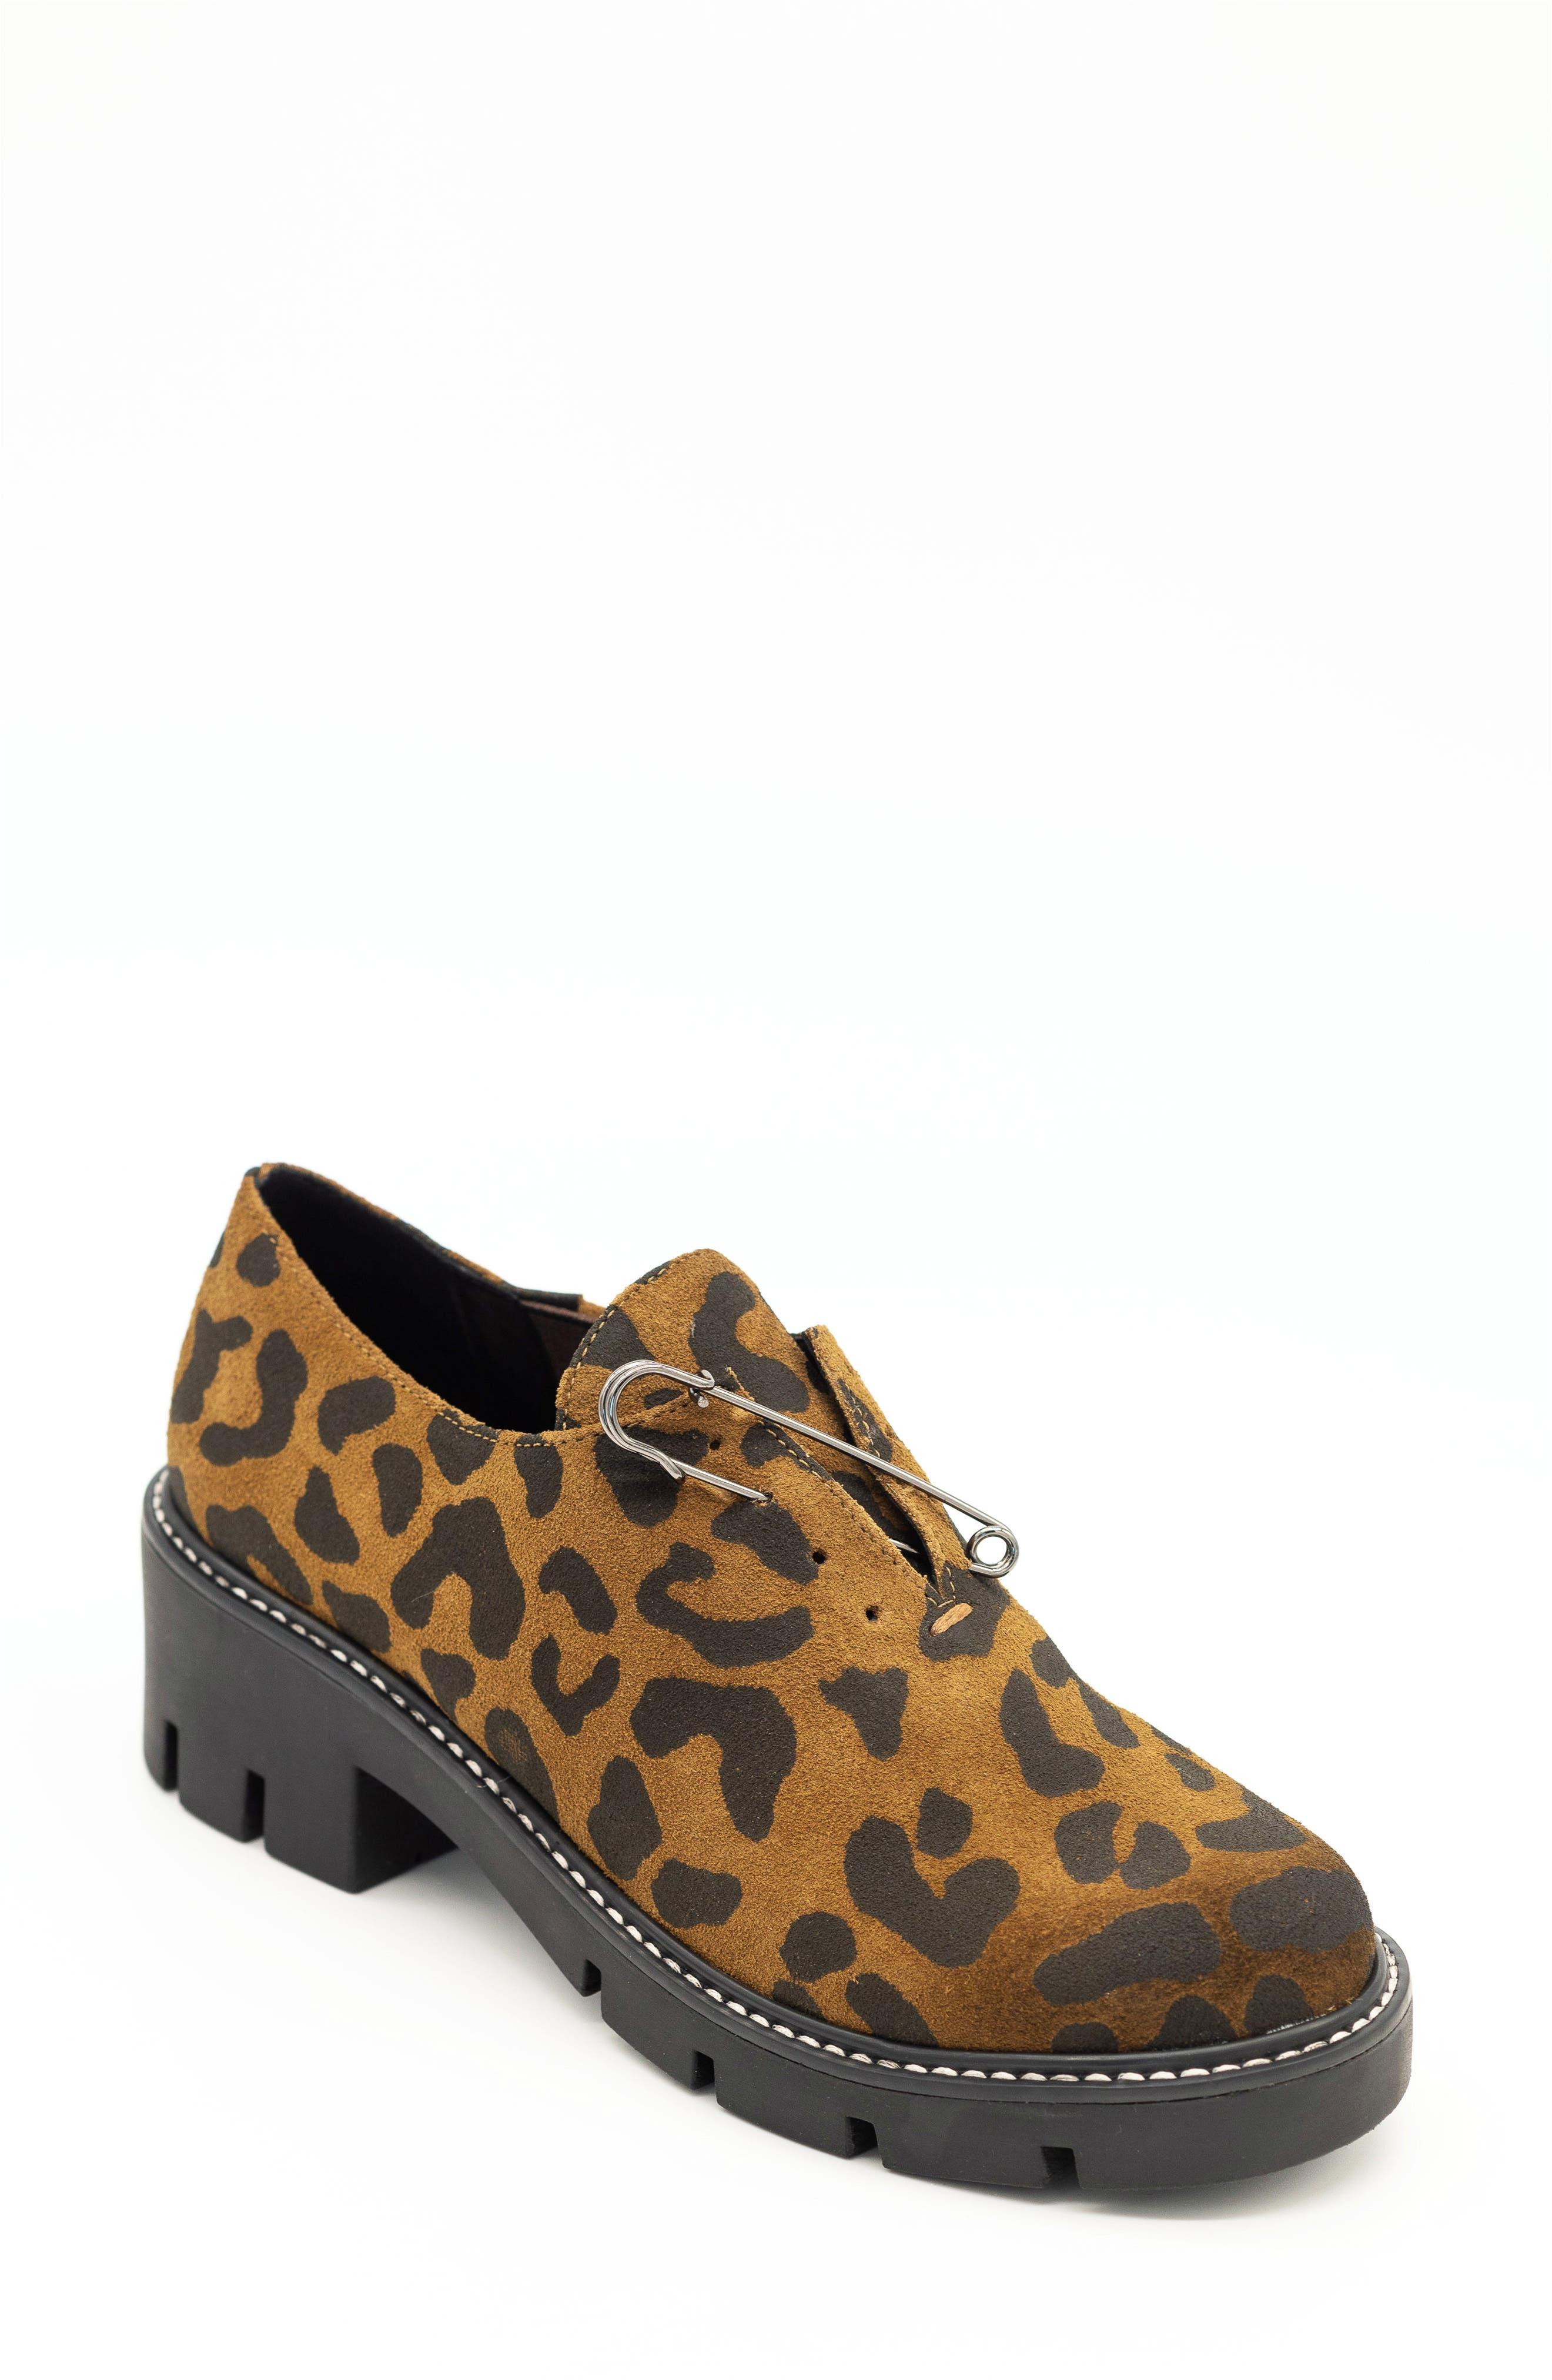 Clash Loafer